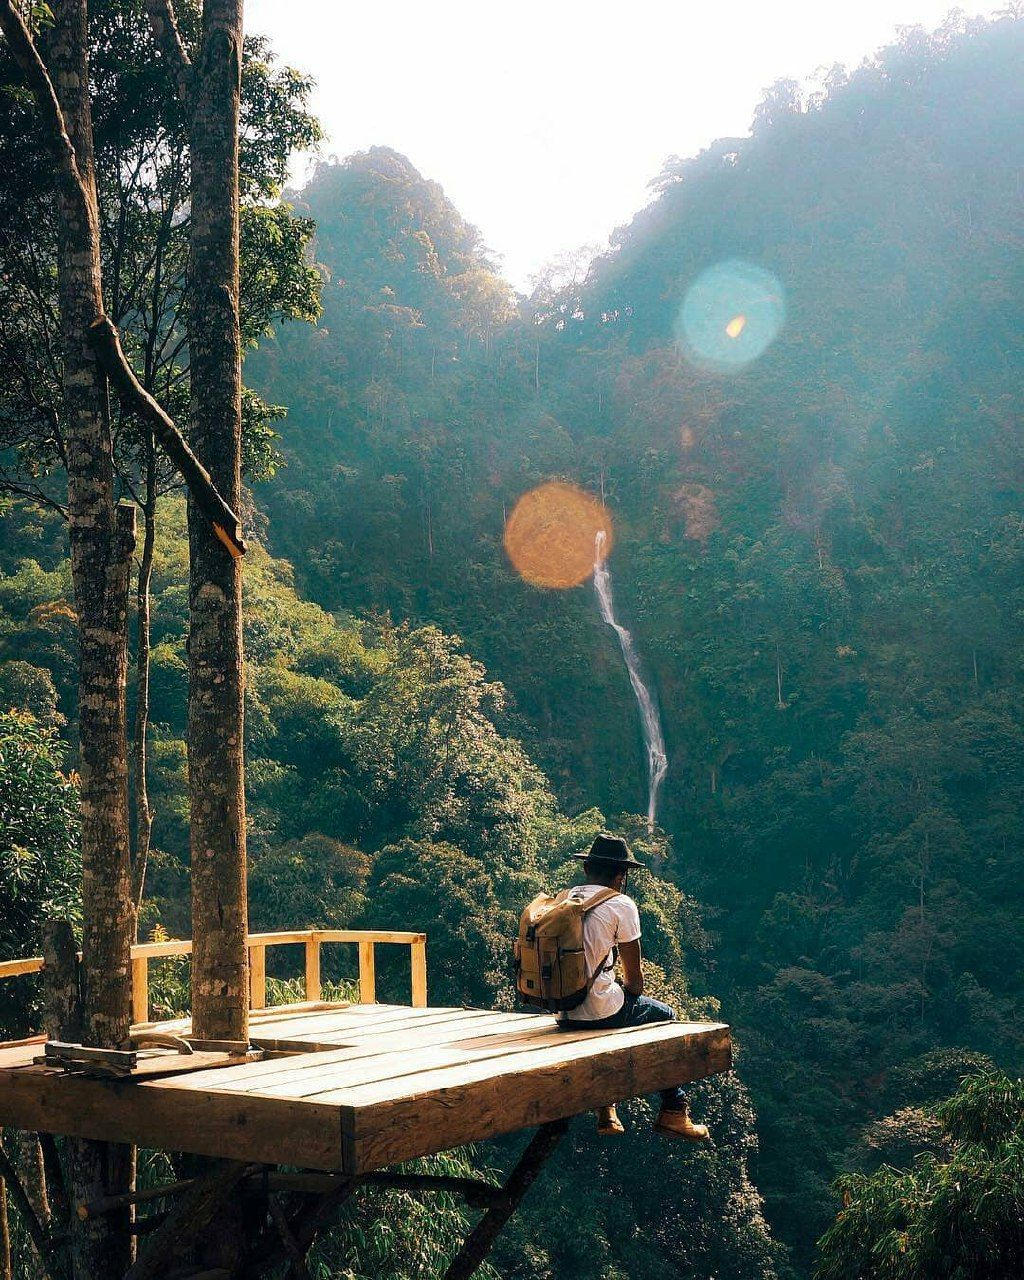 A Beautiful View Of Curug Cibareubeuy Waterfall In Subang